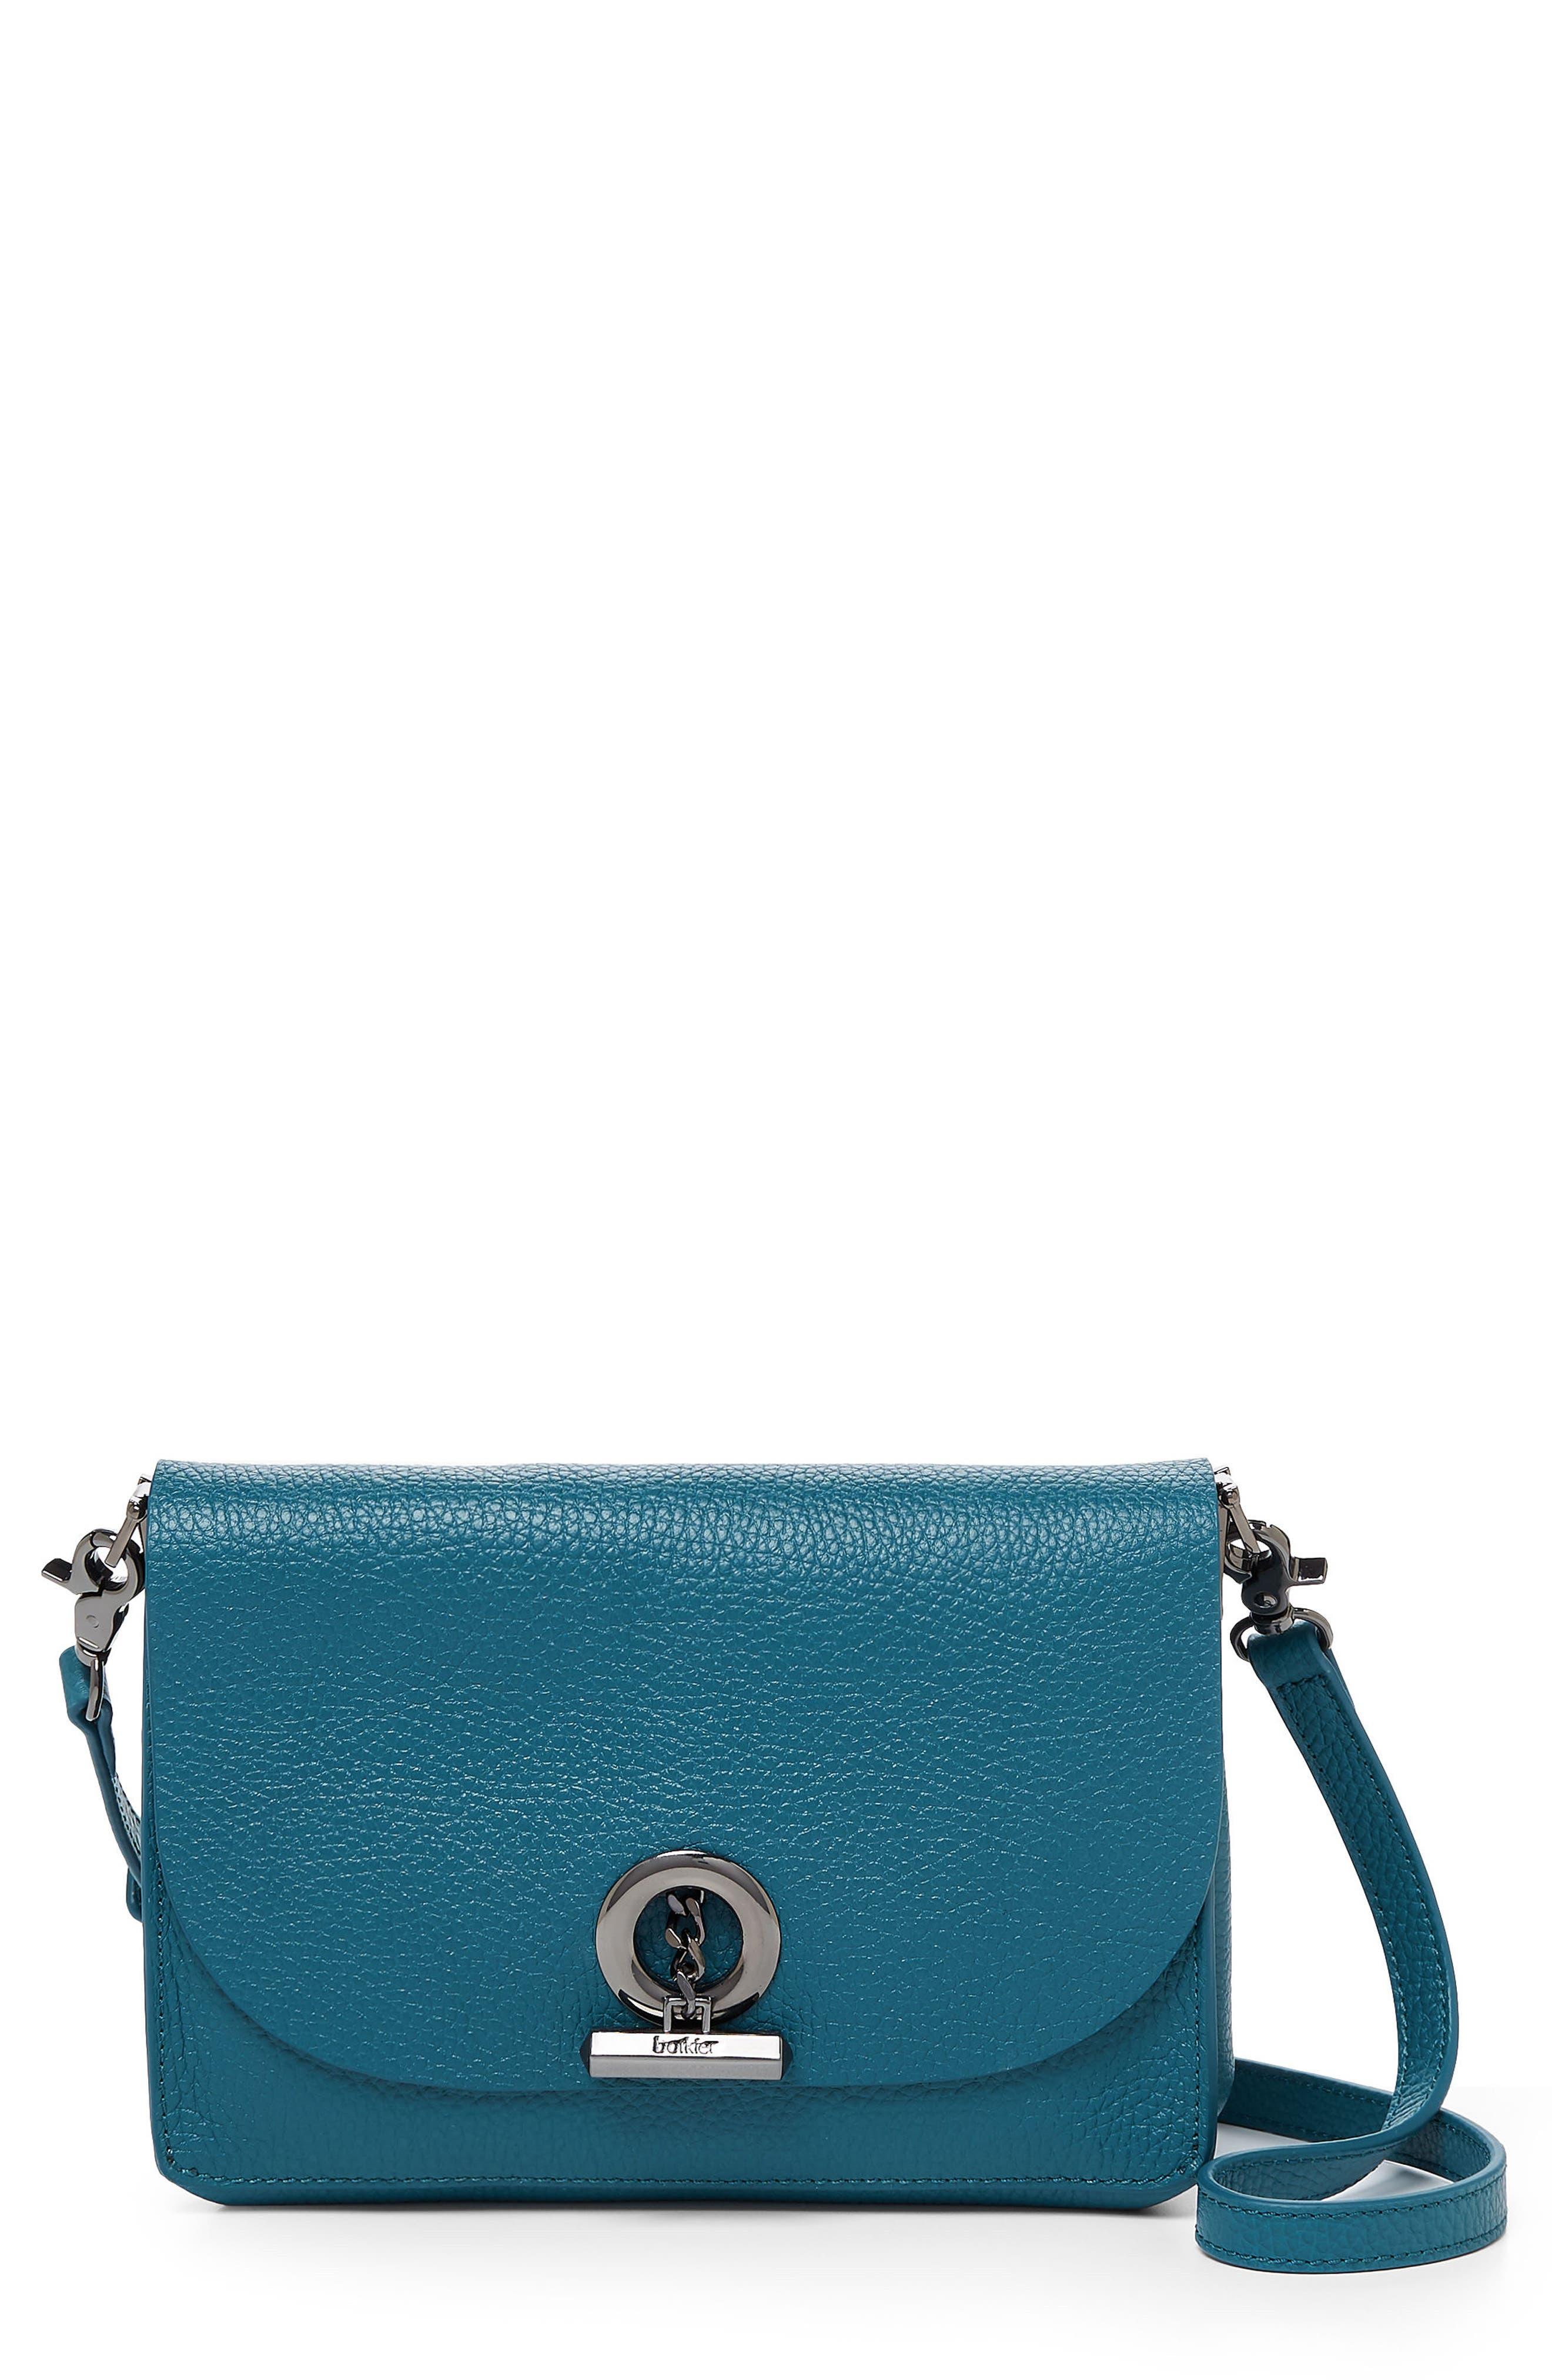 Waverly Leather Crossbody Bag,                             Main thumbnail 5, color,